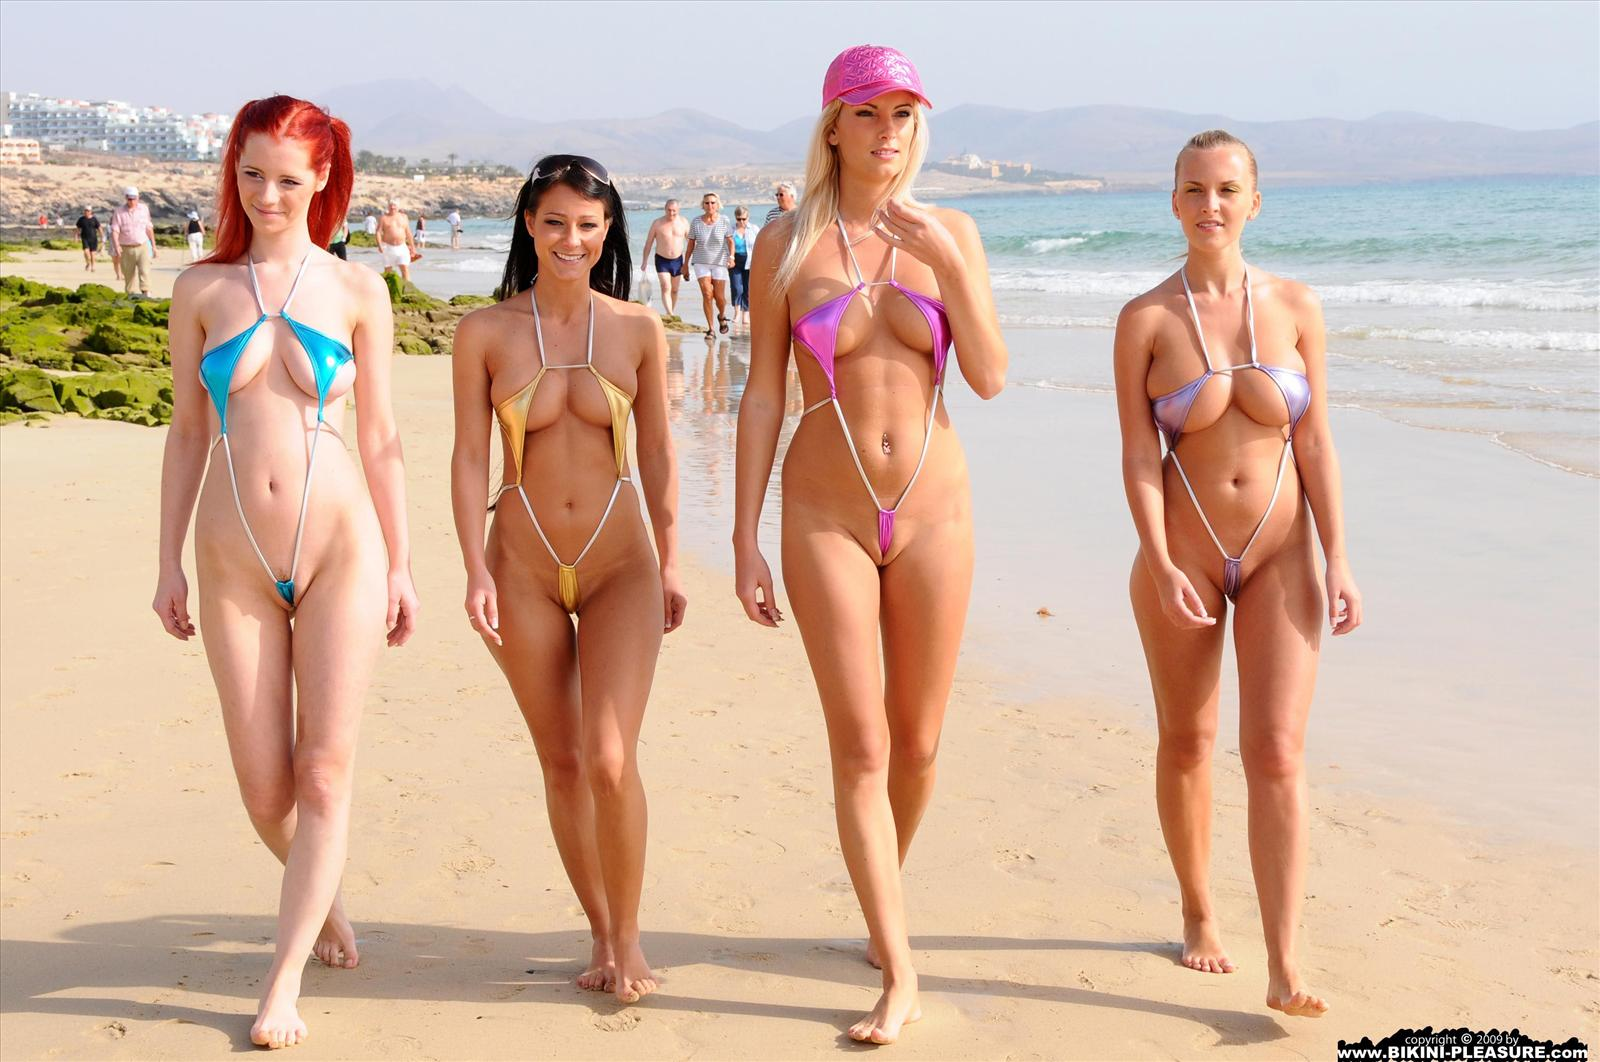 Best Nude Beaches in America PHOTOS - Thrillist